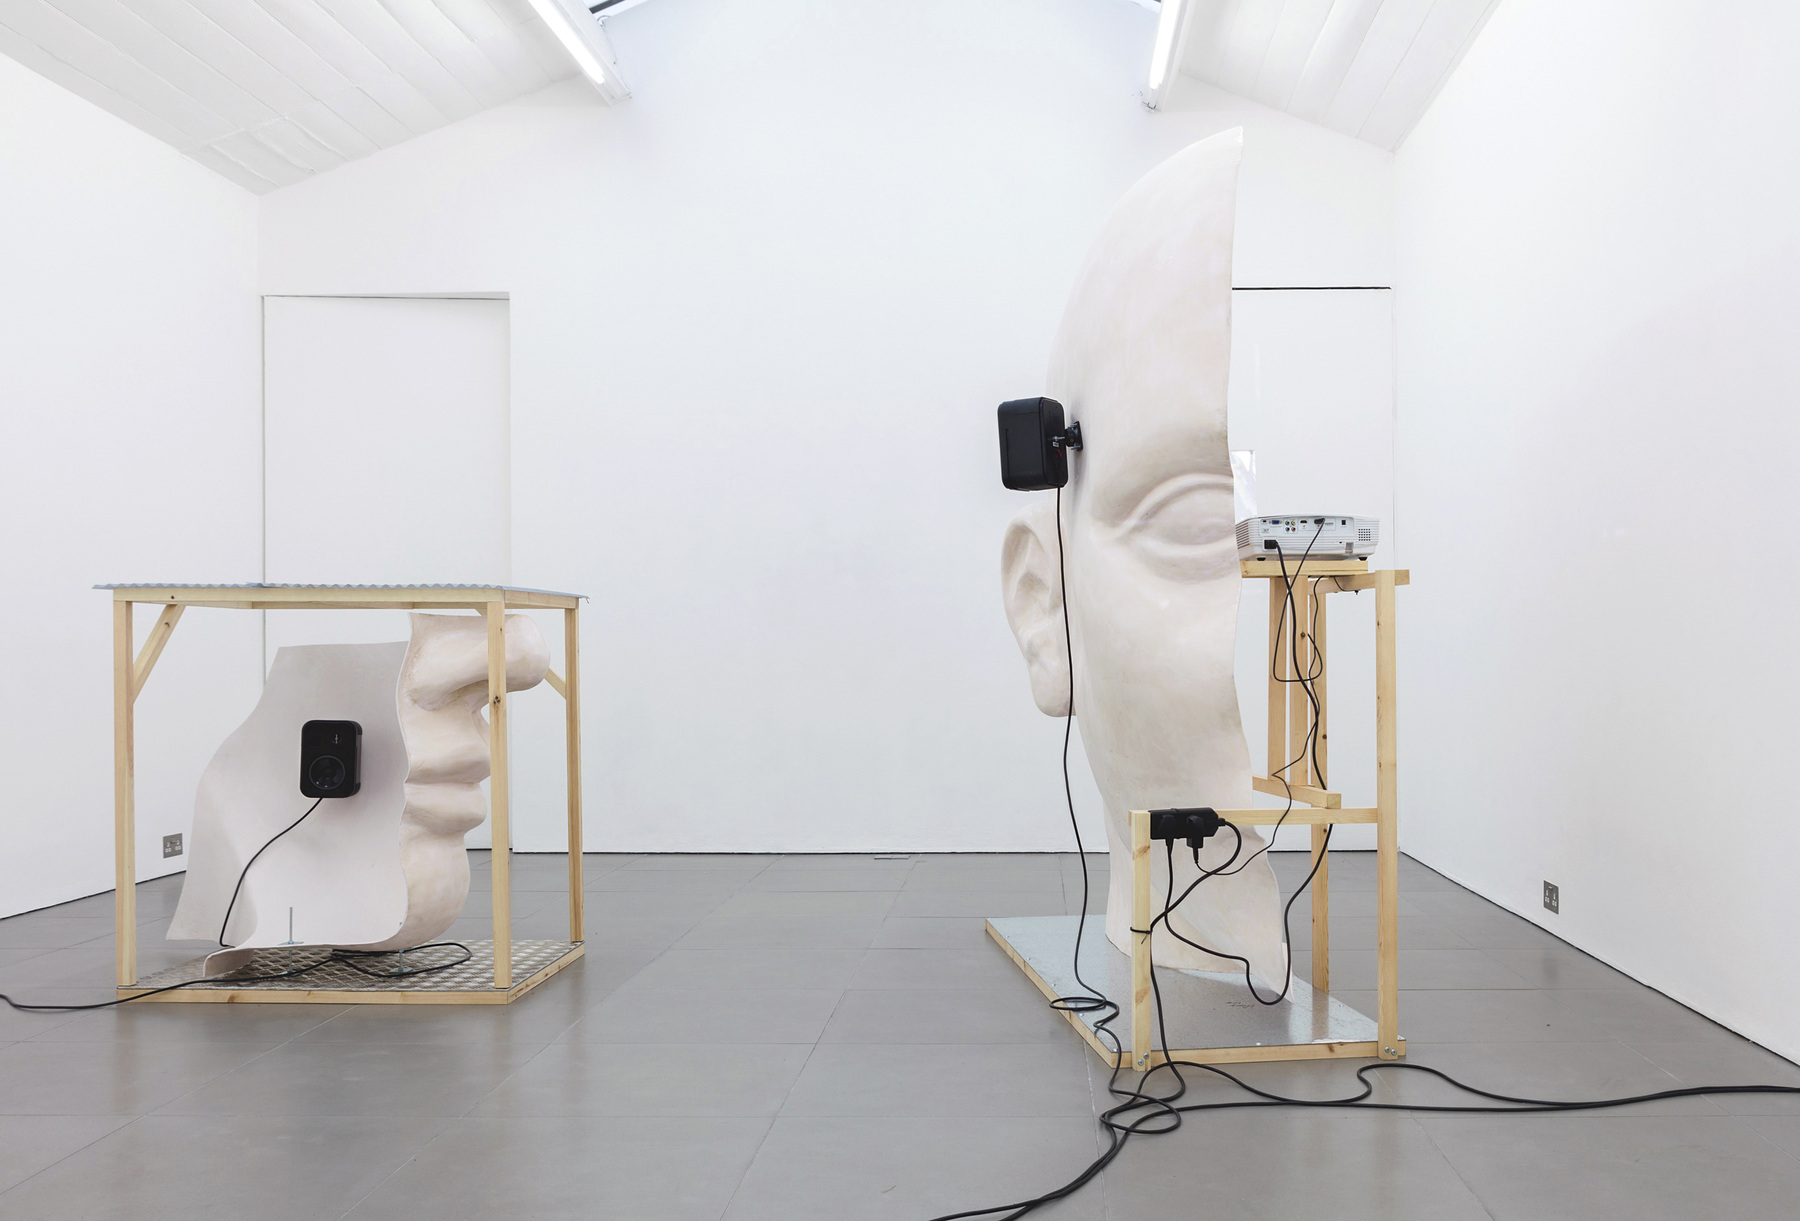 01. Anne de Vries, SUBMISSION 2015, wood, metal, fibreglass resin, audio, video